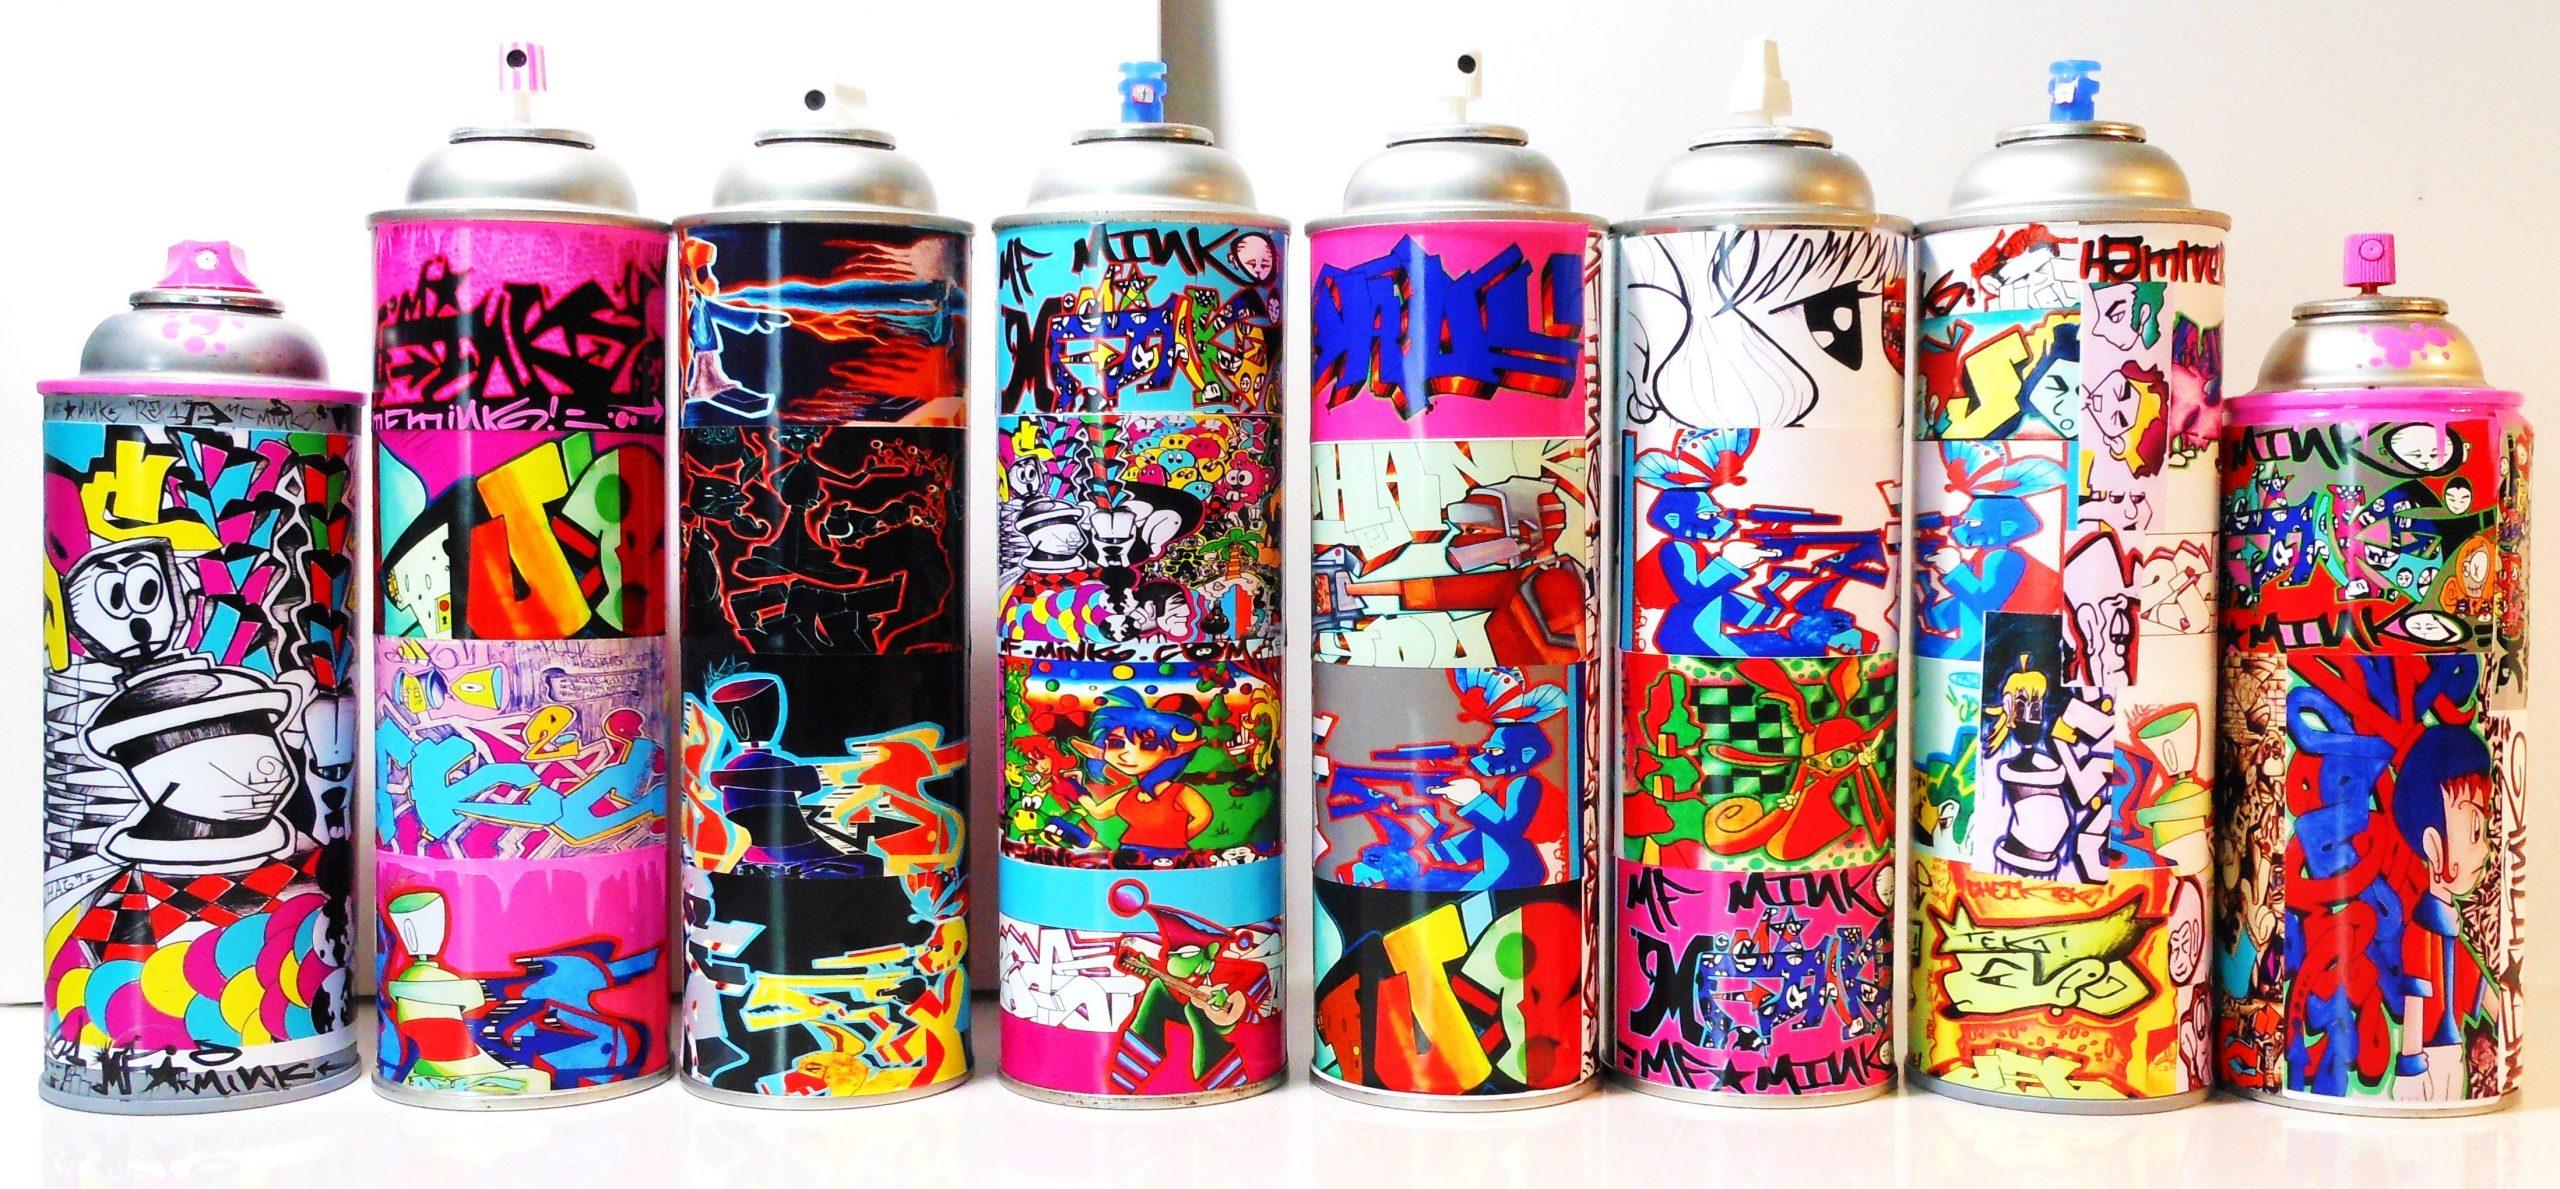 Australian Street Art For Sale